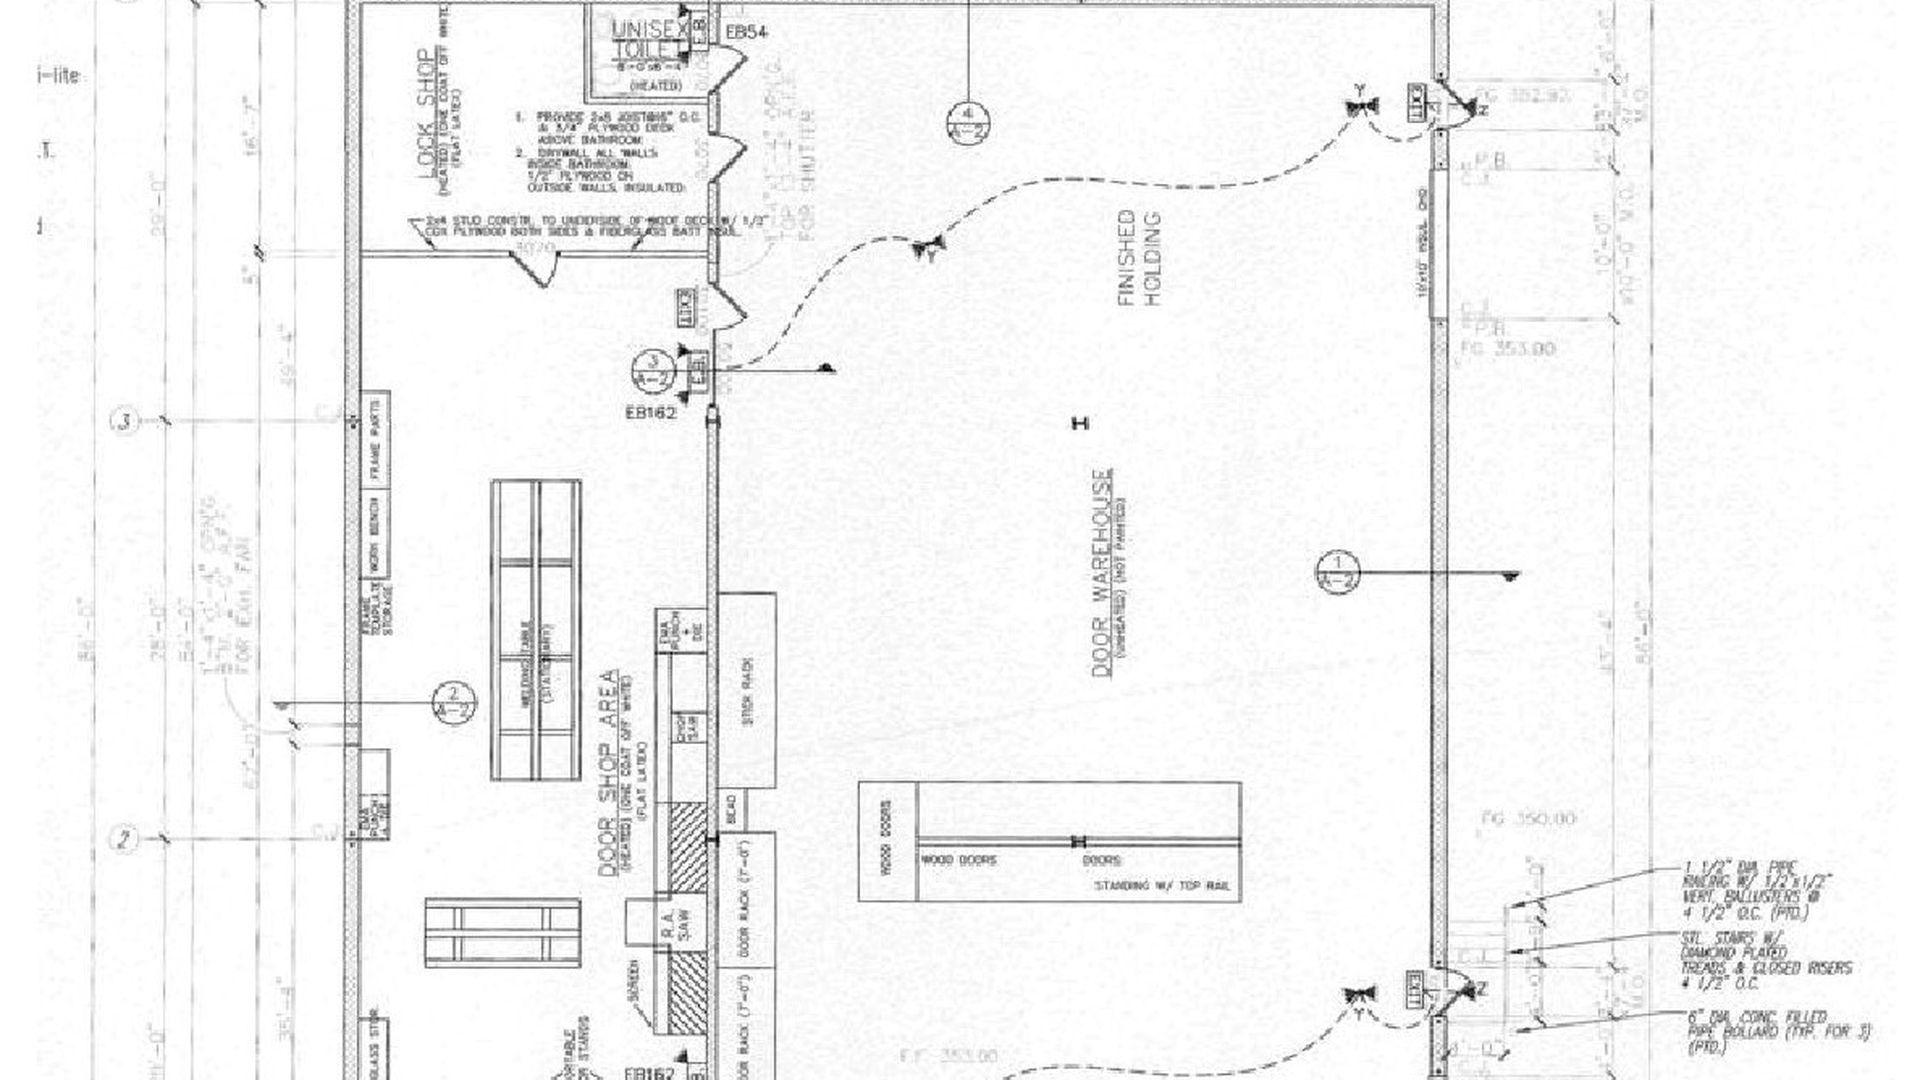 984b Marcon Blvd Allentown Pa United States